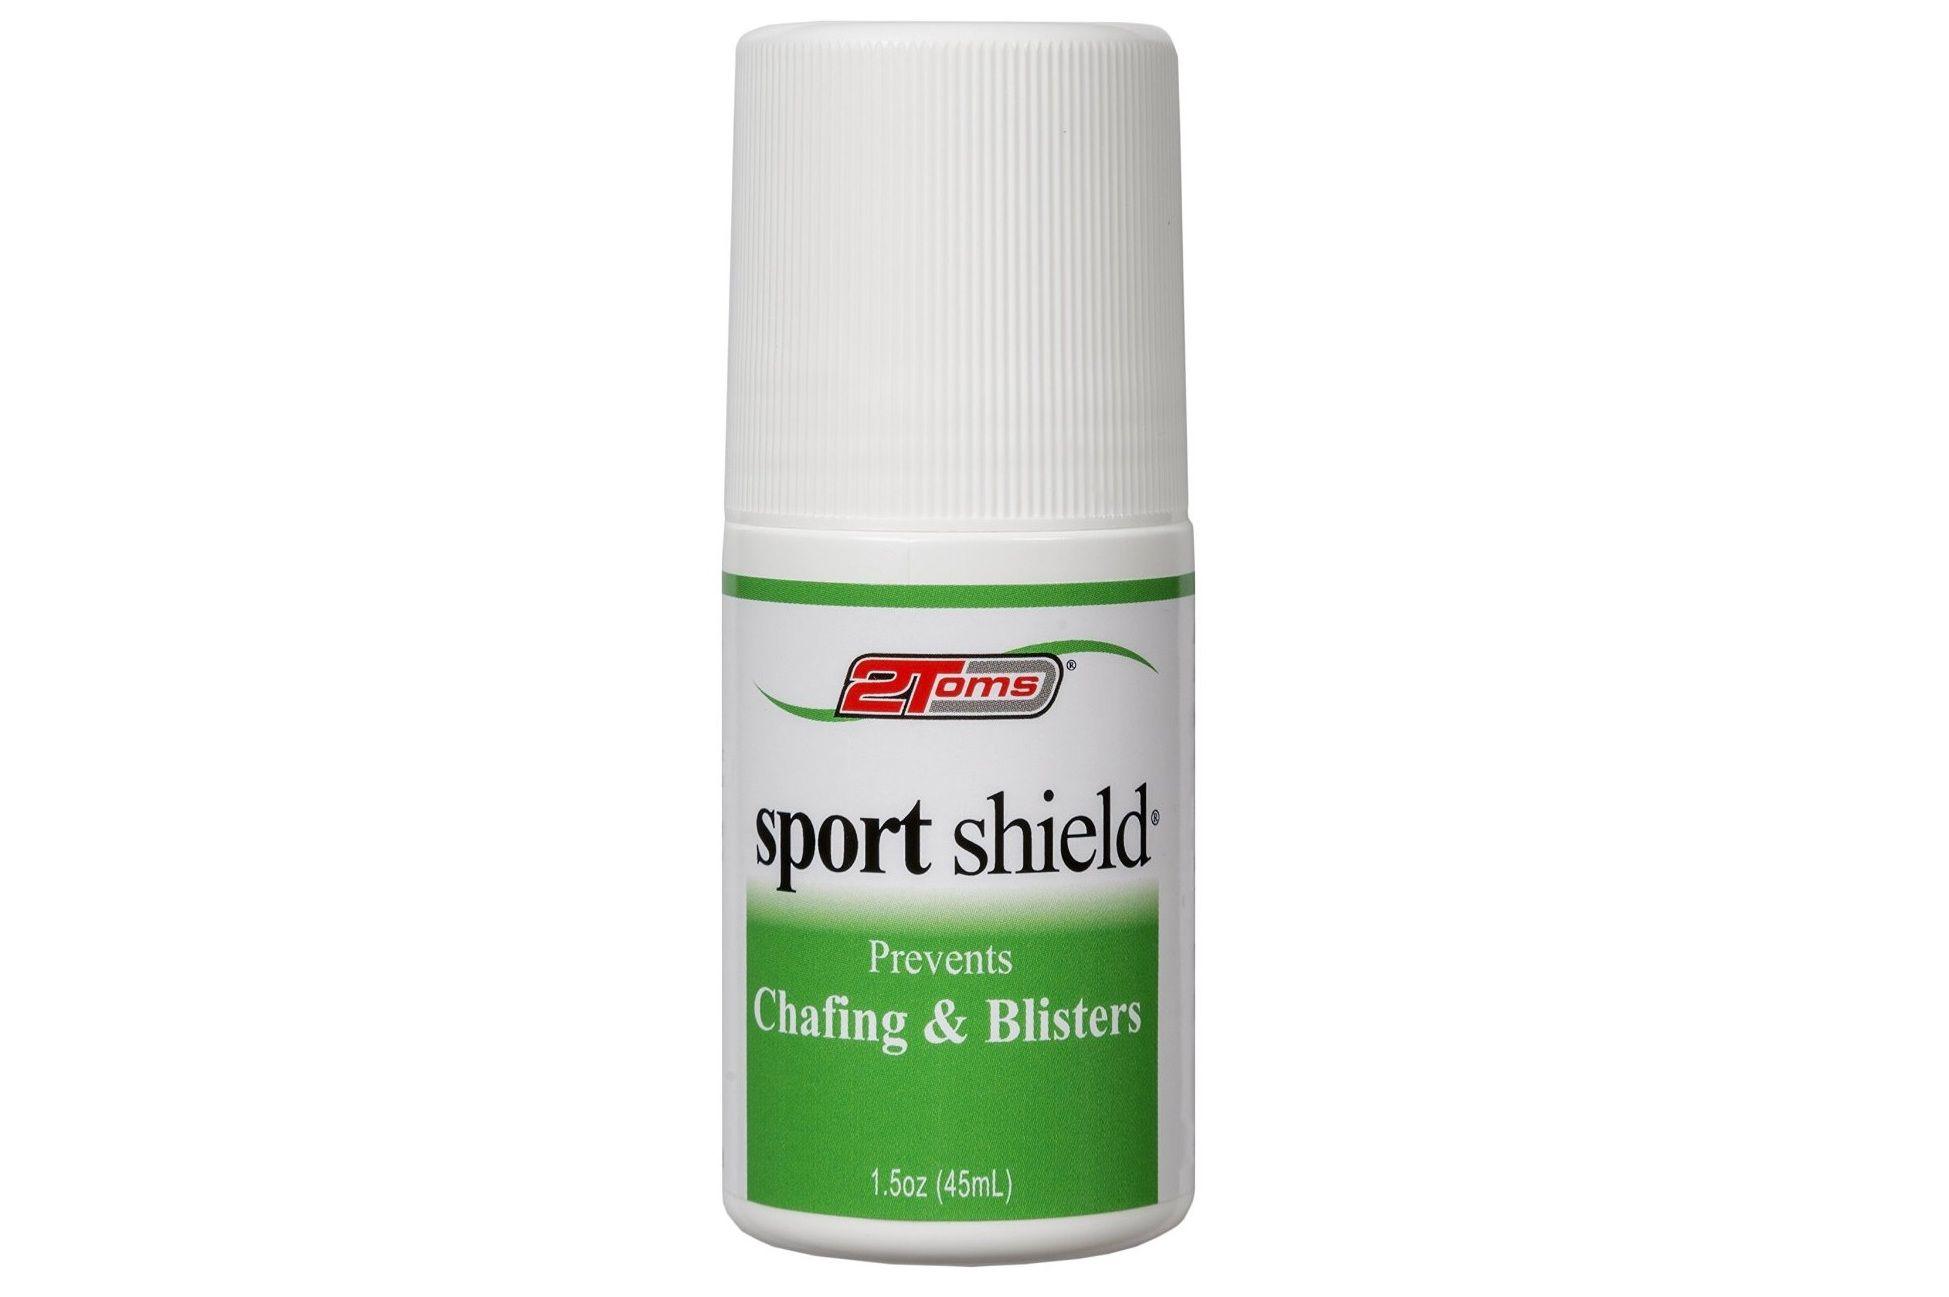 2Toms Sport Shield Roll-On